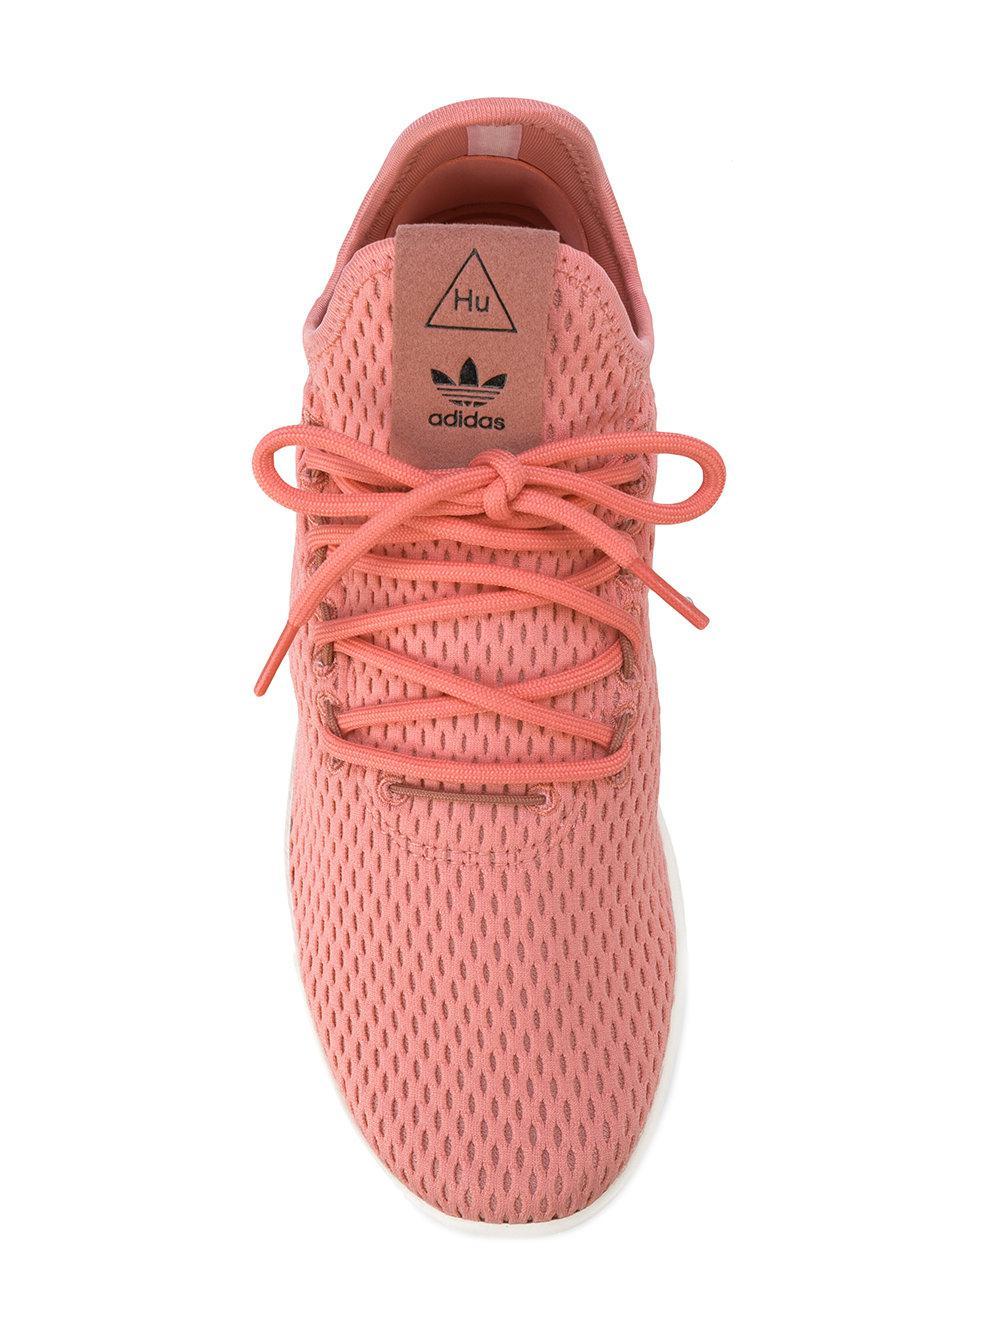 adidas Synthetic X Pharrell Williams Tennis Hu Sneakers in Pink & Purple (Pink)